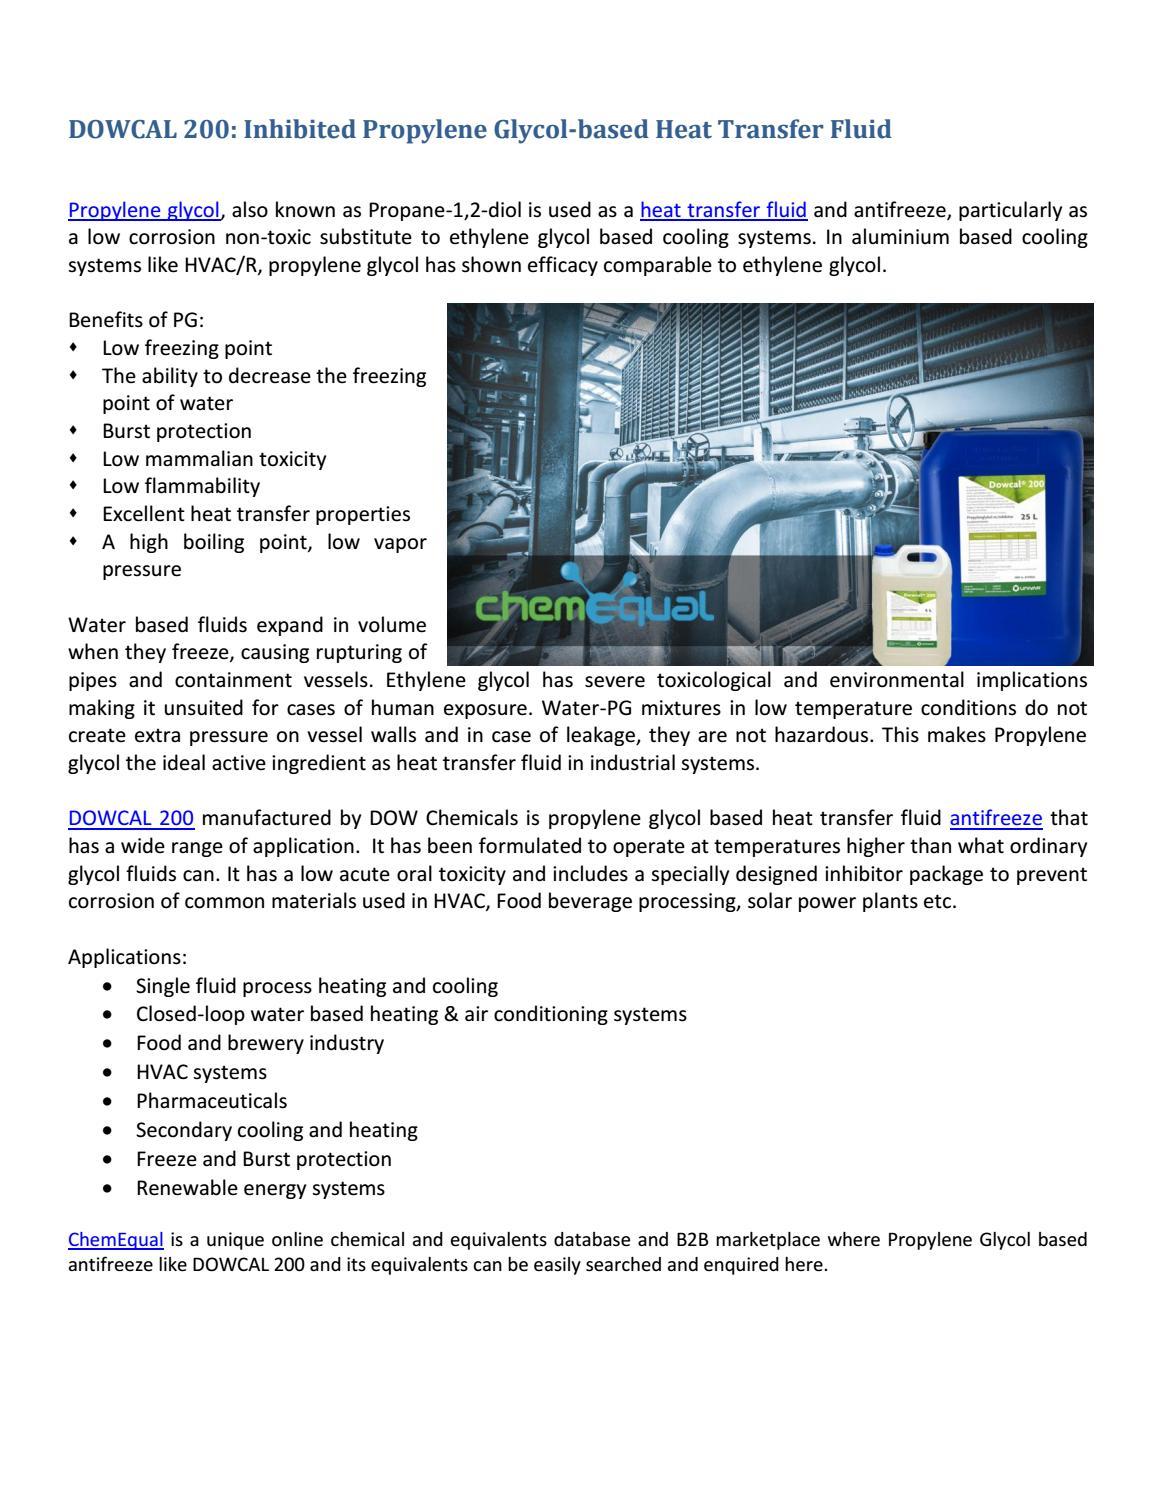 DOWCAL 200 Inhibited Propylene Glycol based Heat Transfer